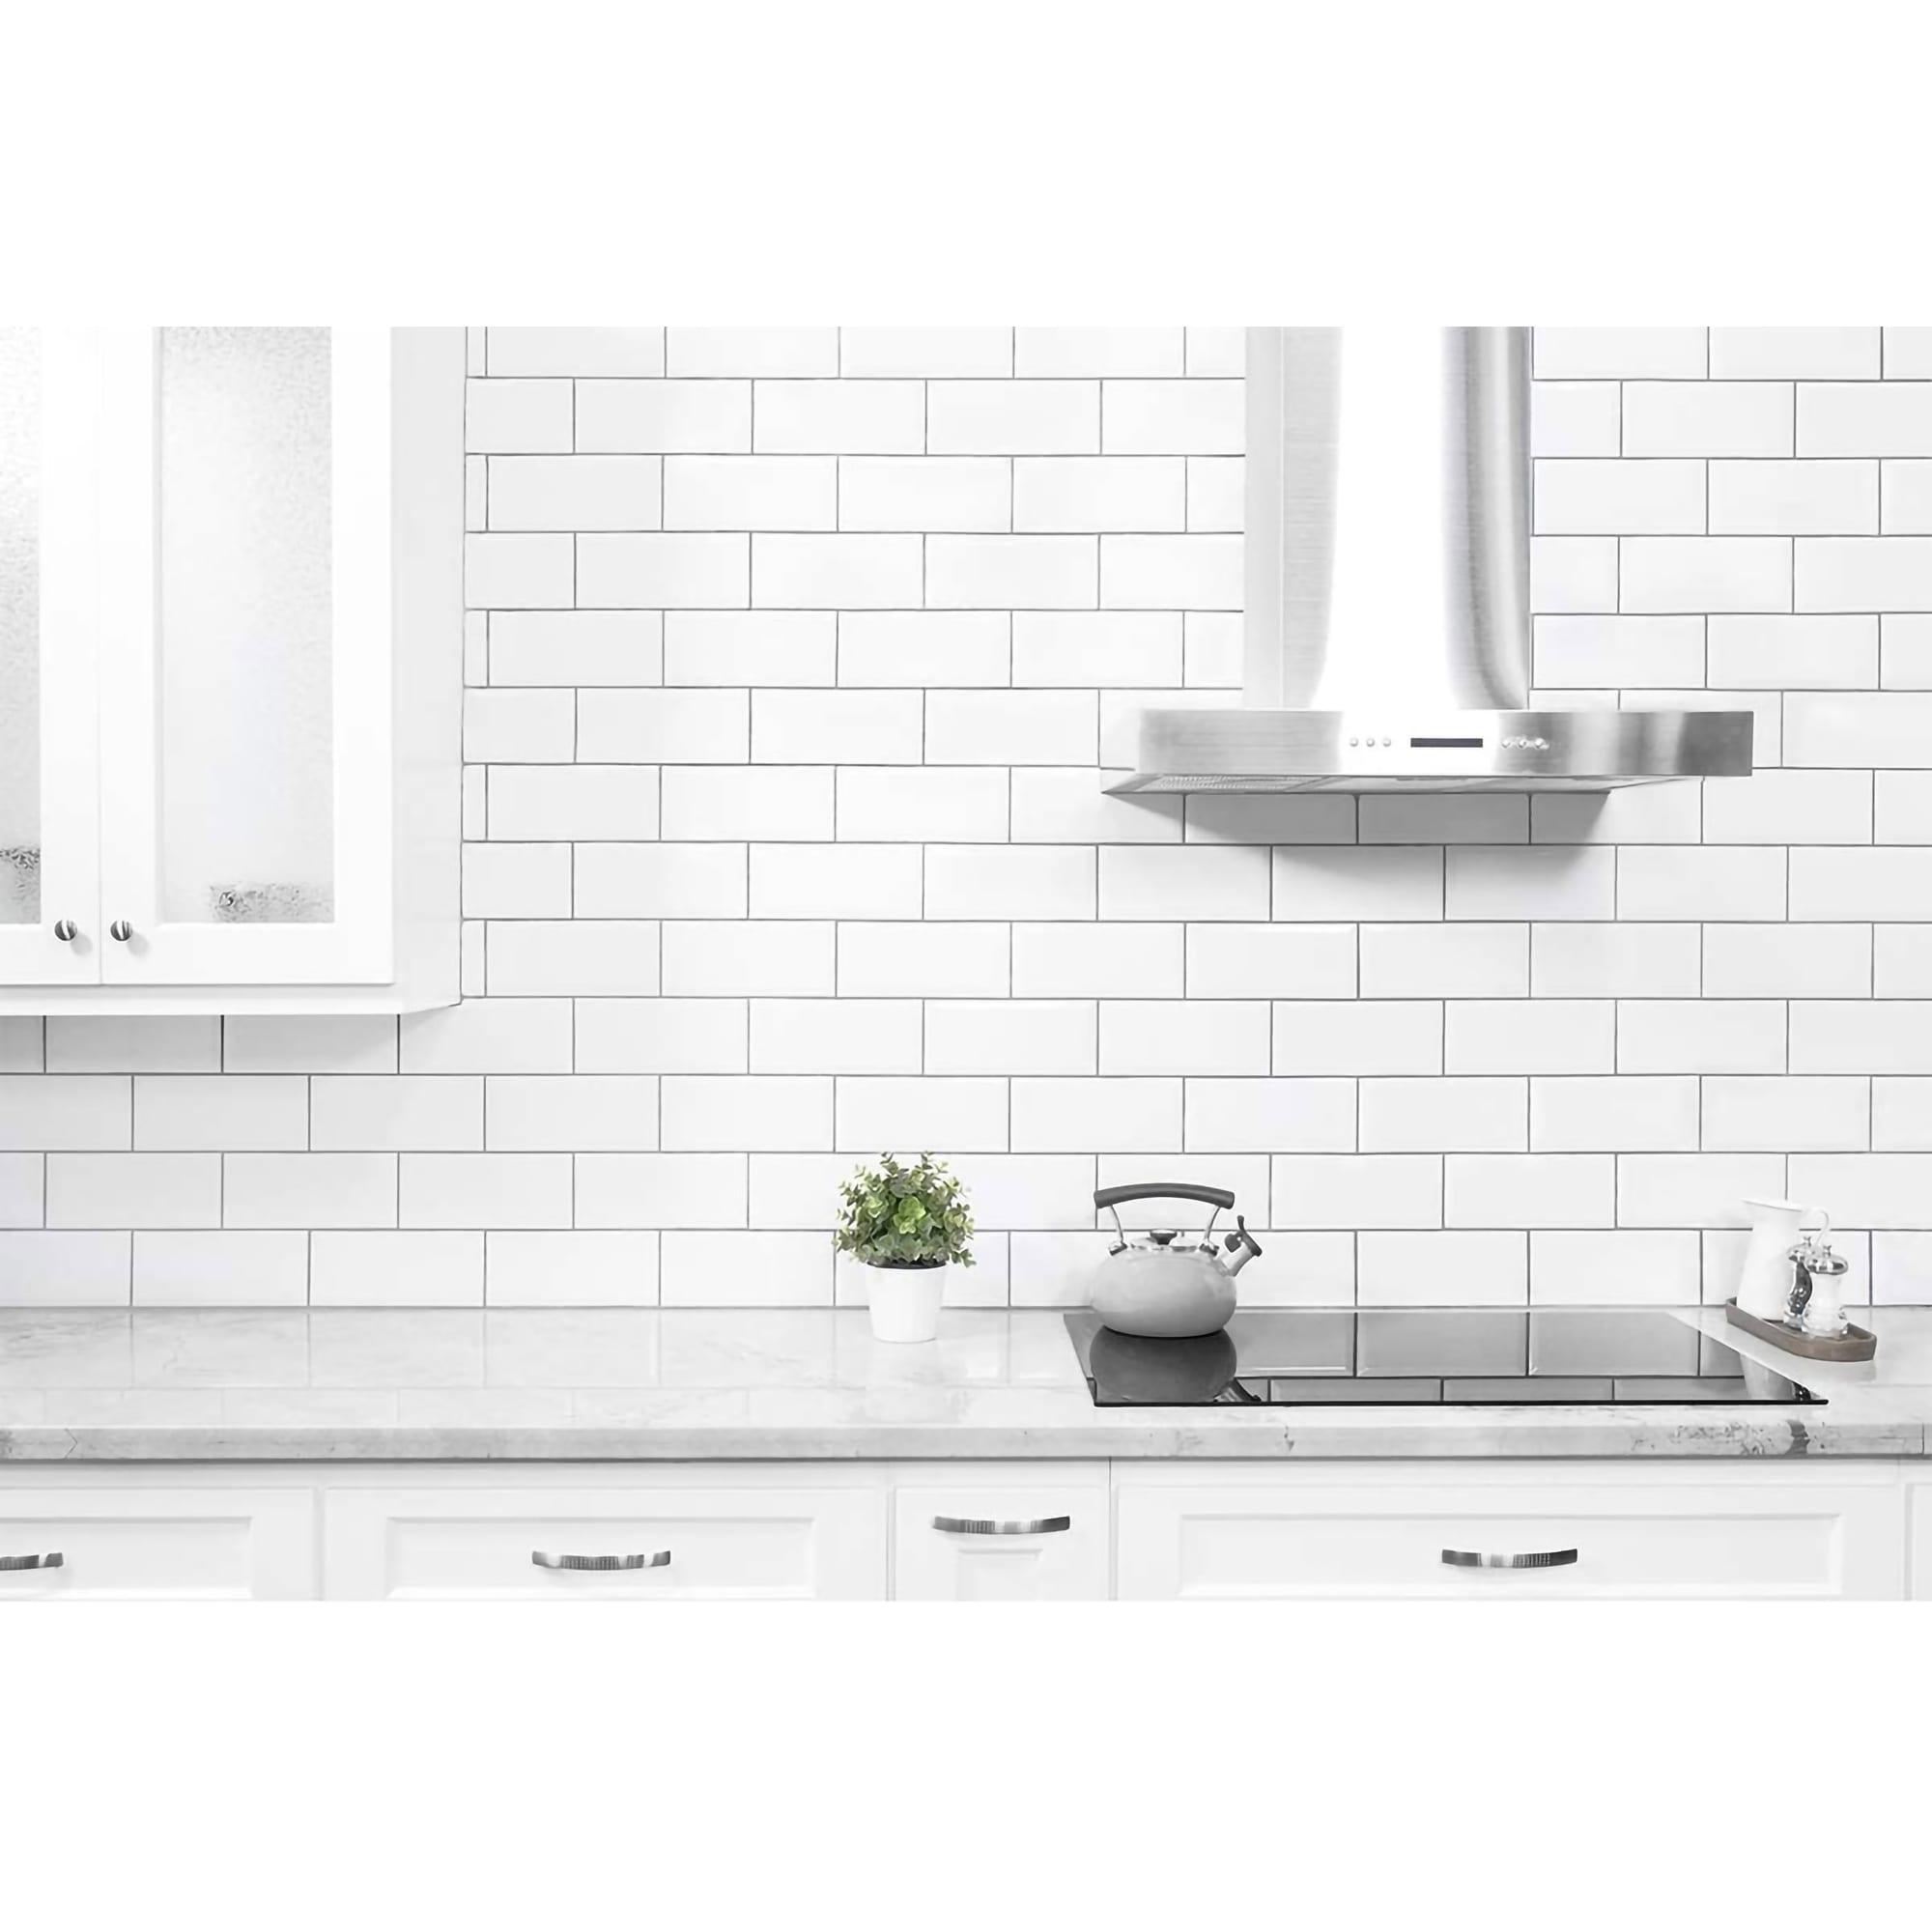 Art3d 14 X12 Eva Self Adhesive Backsplash Tiles Faux Ceramic Tile 10 Pack Floral White Overstock 31584851